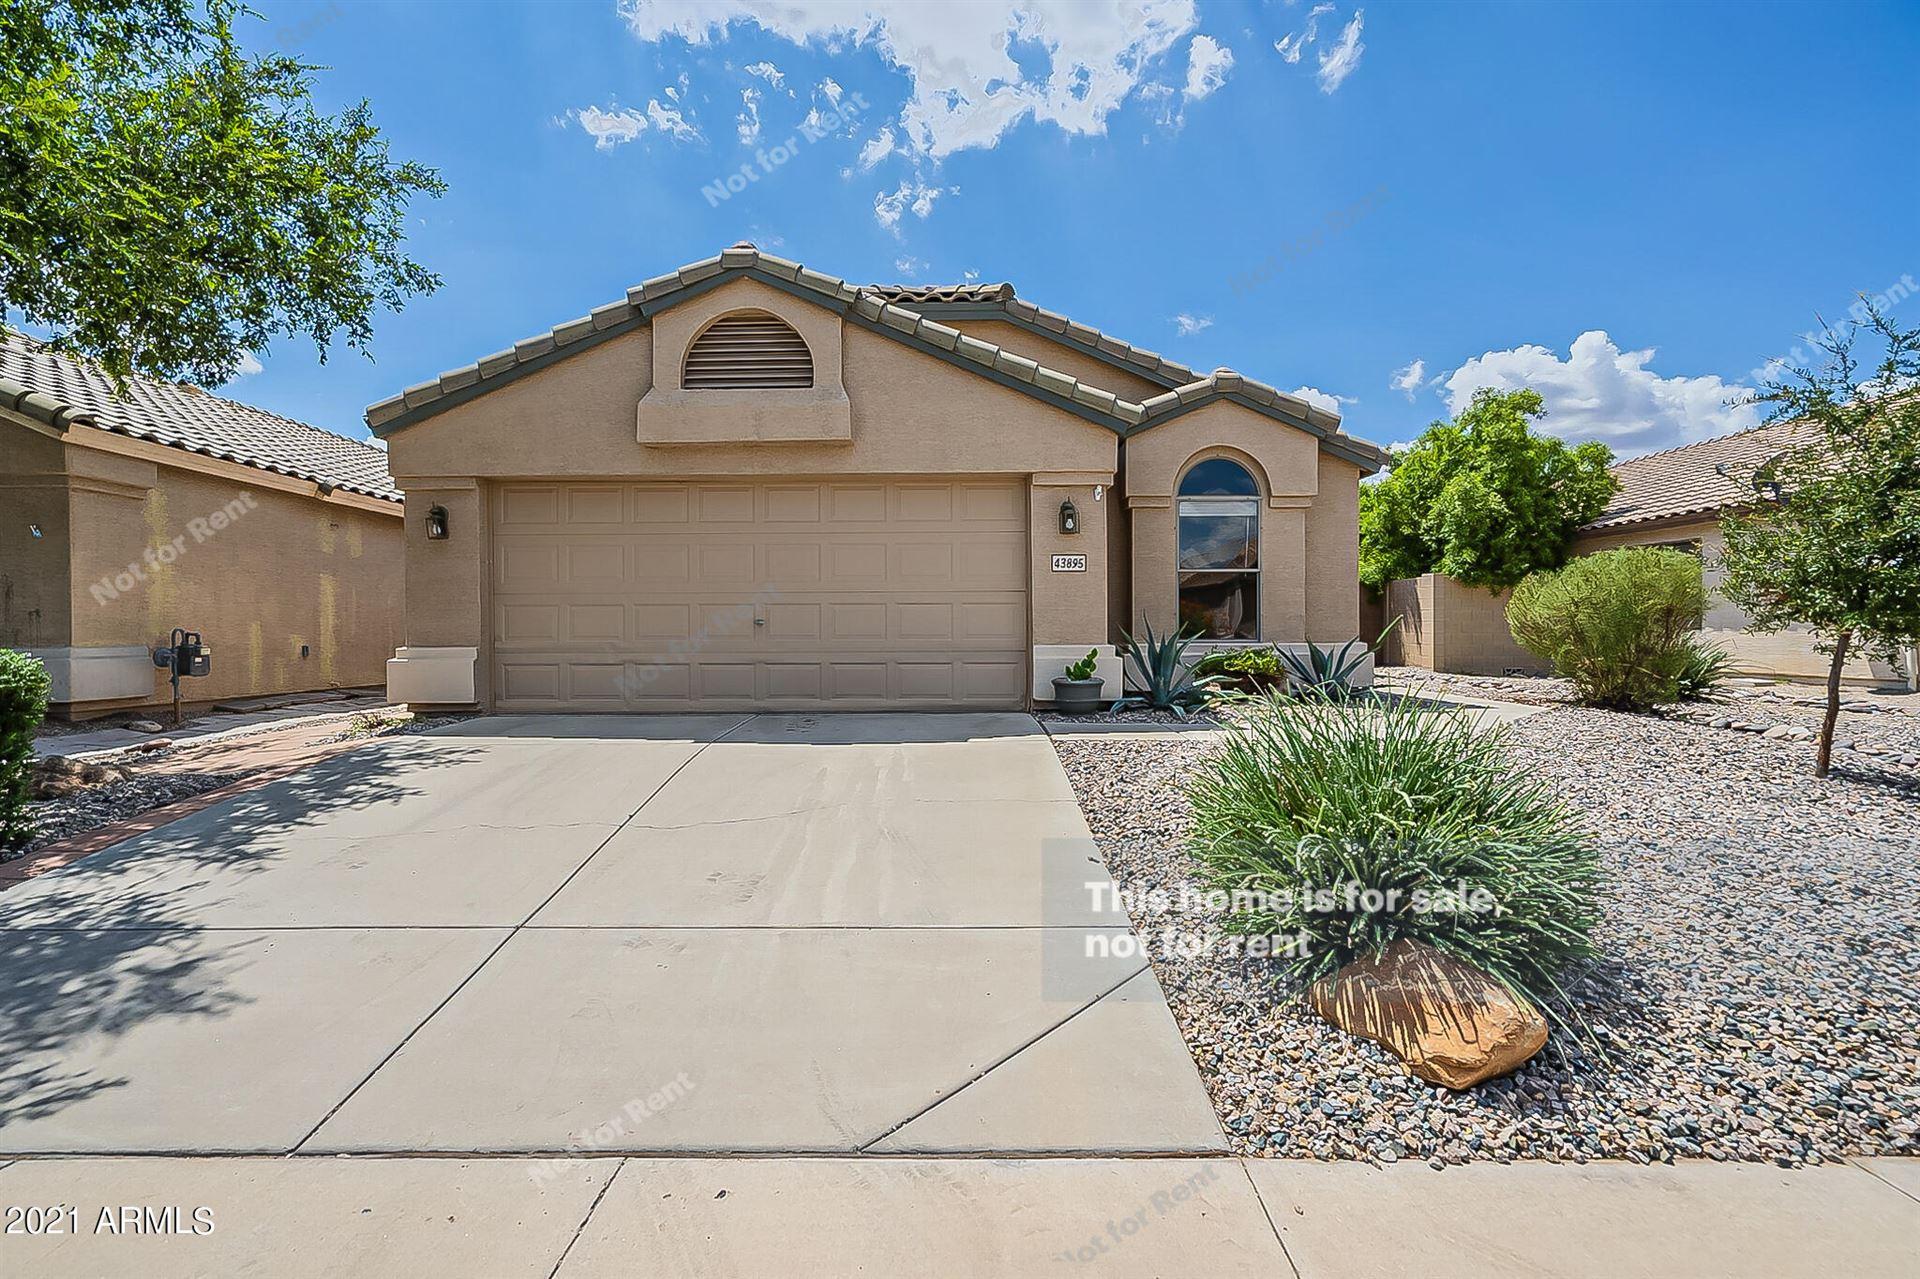 Photo for 43895 W CAHILL Drive, Maricopa, AZ 85138 (MLS # 6285525)